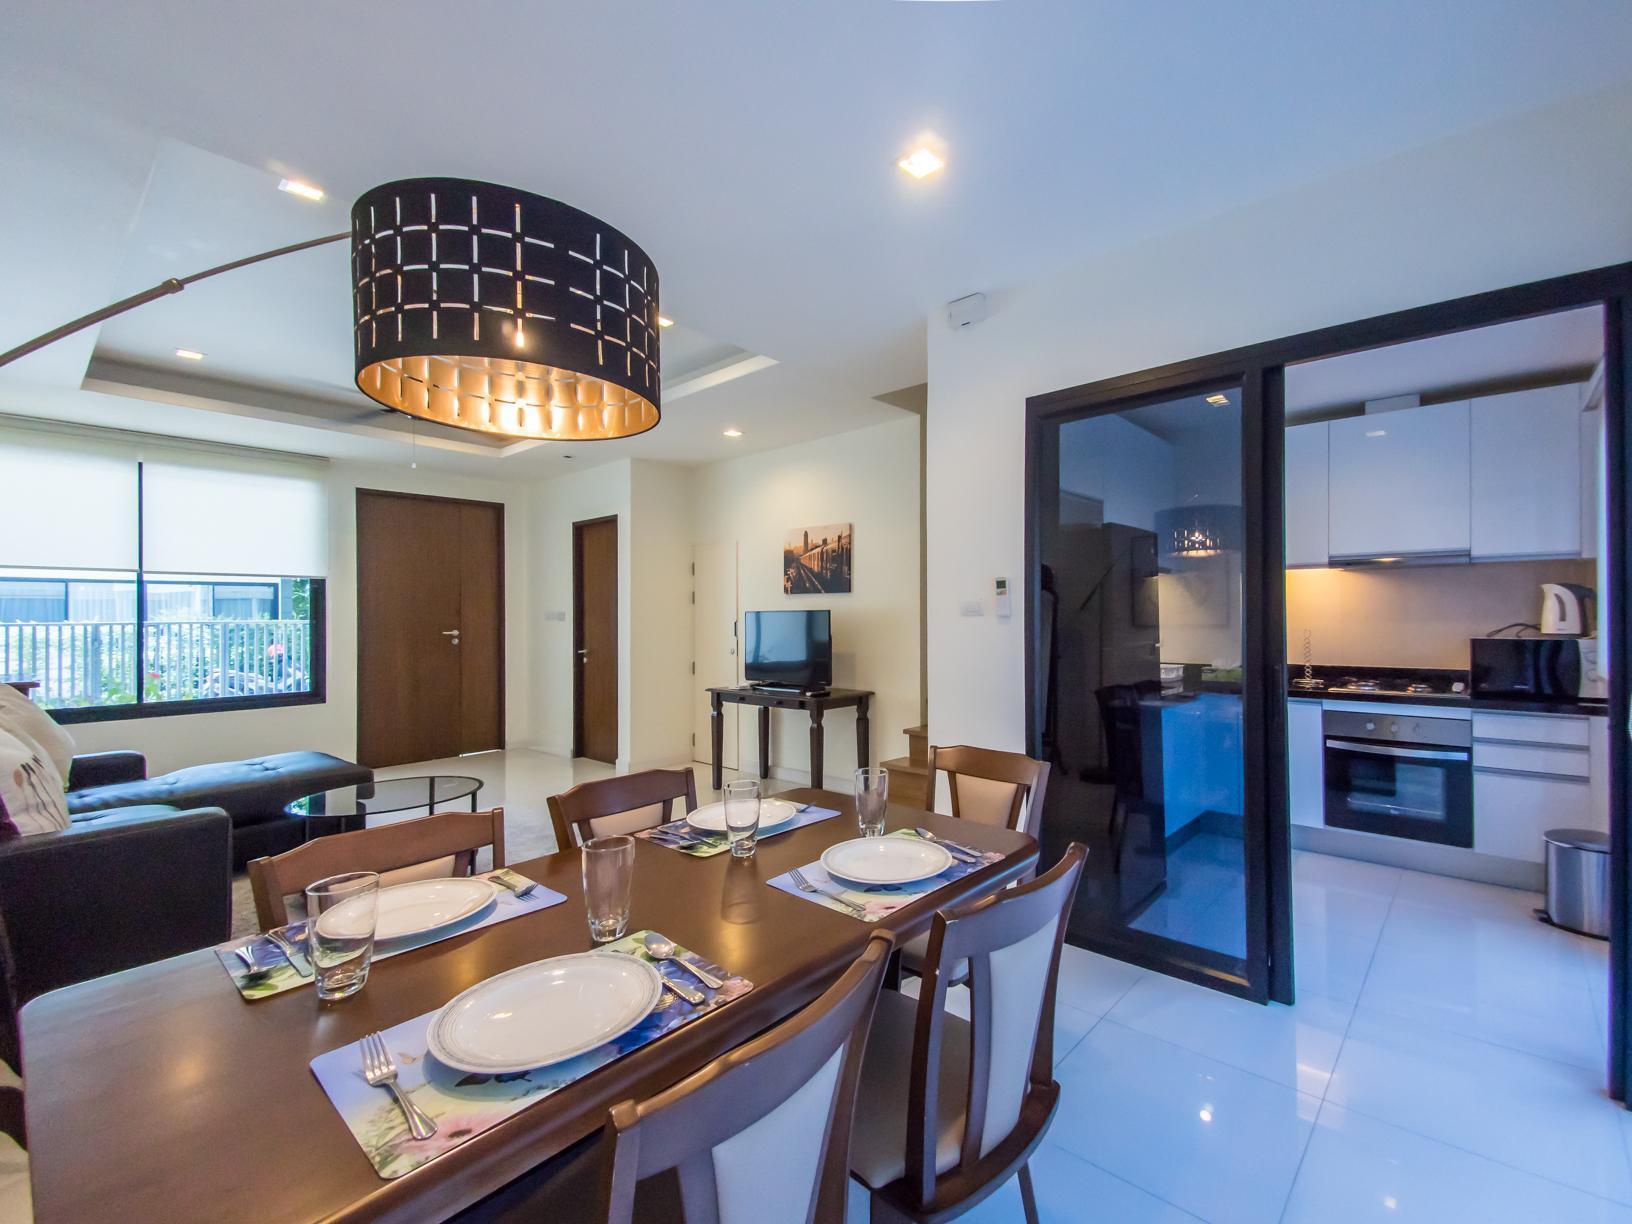 3 BDR Laguna Park Phuket Holiday Home, Nr. 20 บ้านเดี่ยว 3 ห้องนอน 4 ห้องน้ำส่วนตัว ขนาด 175 ตร.ม. – บางเทา